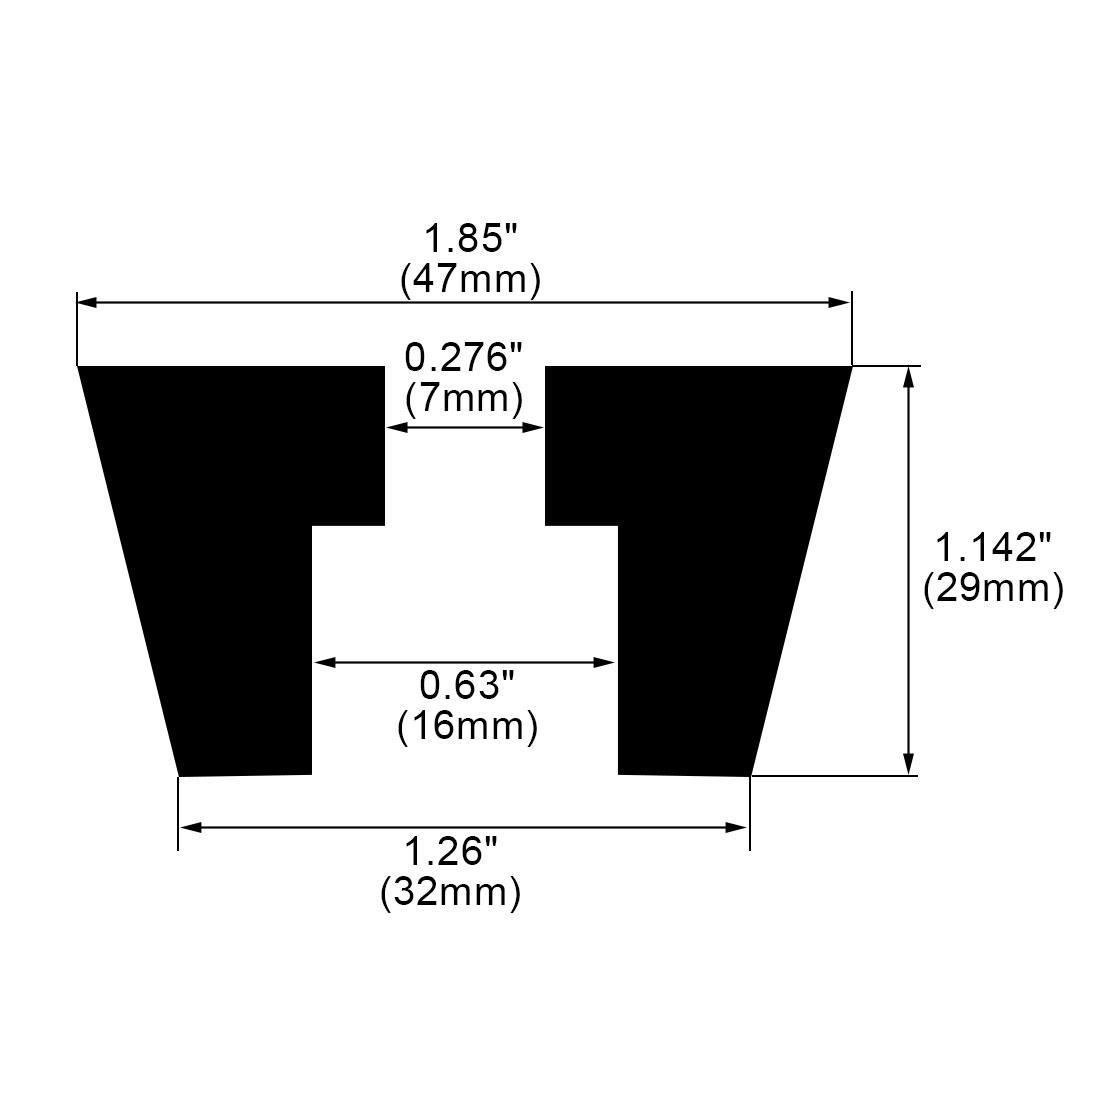 24pcs Rubber Feet Bumper Furniture Speaker Cabinet Leg Pads, D47x32xH29mm - image 2 of 7